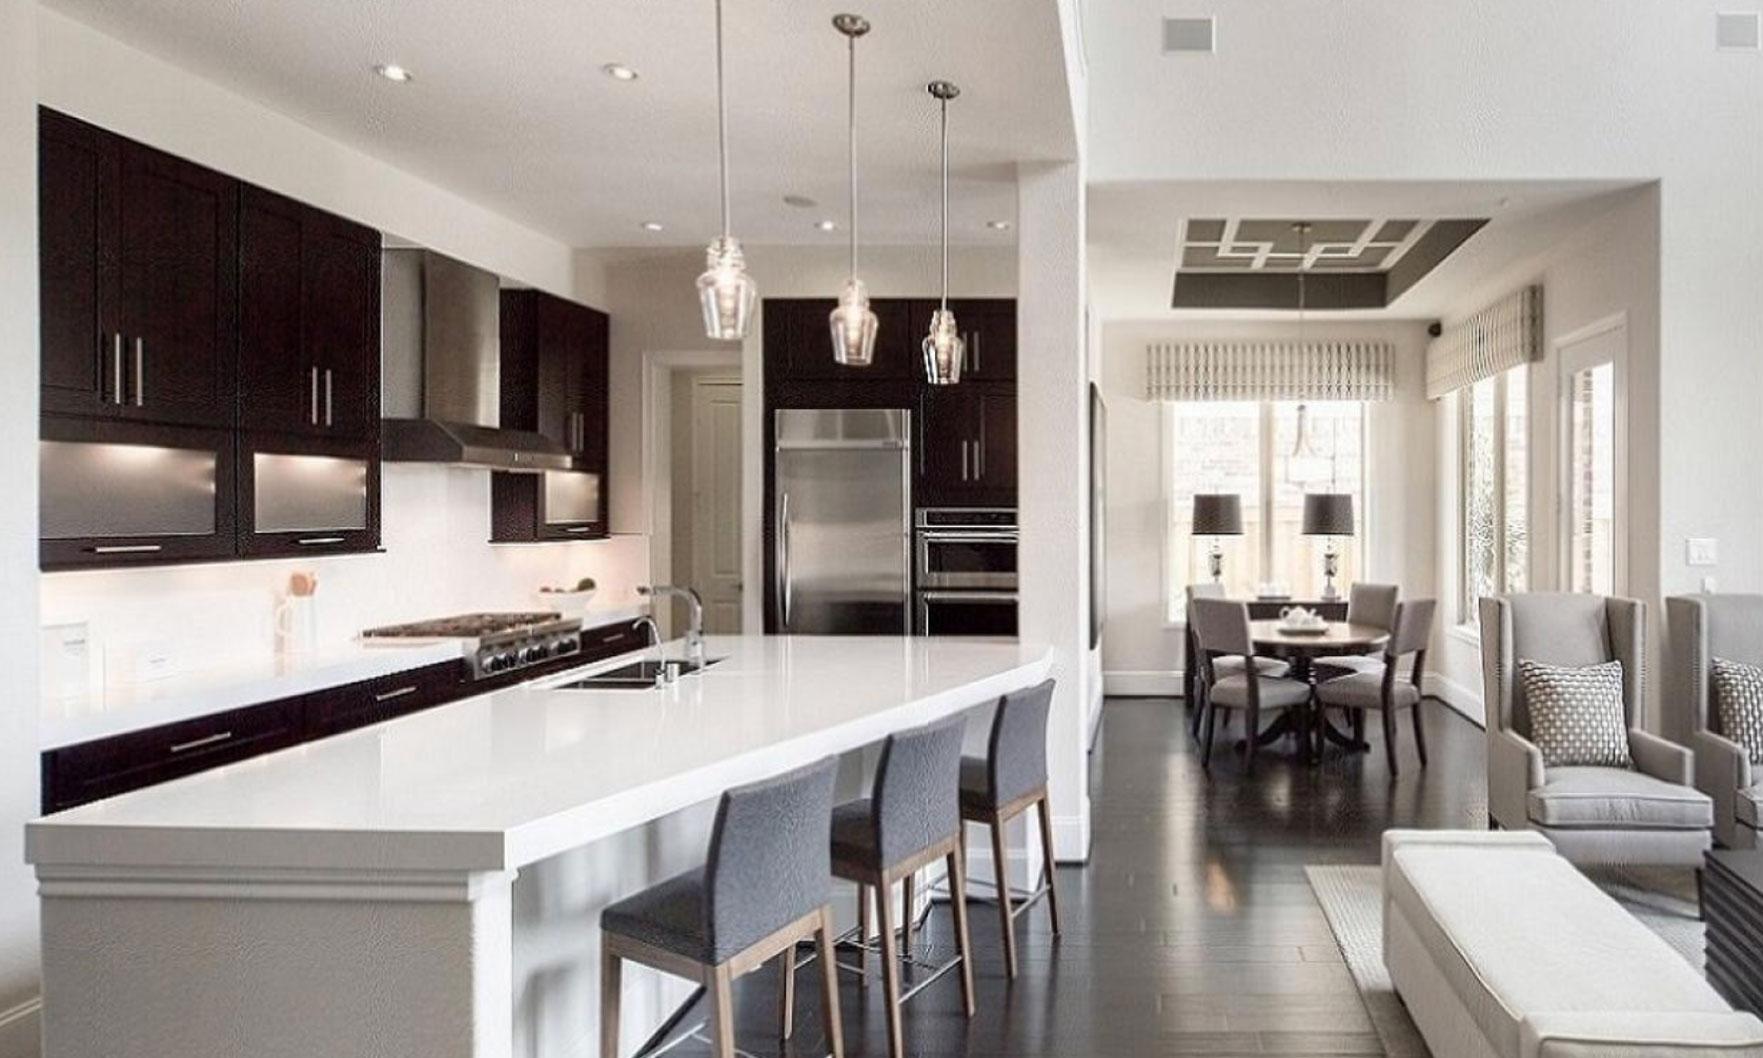 Ashton Woods Introduces Two New Home Models In Houston Markets Houston Agent Magazine